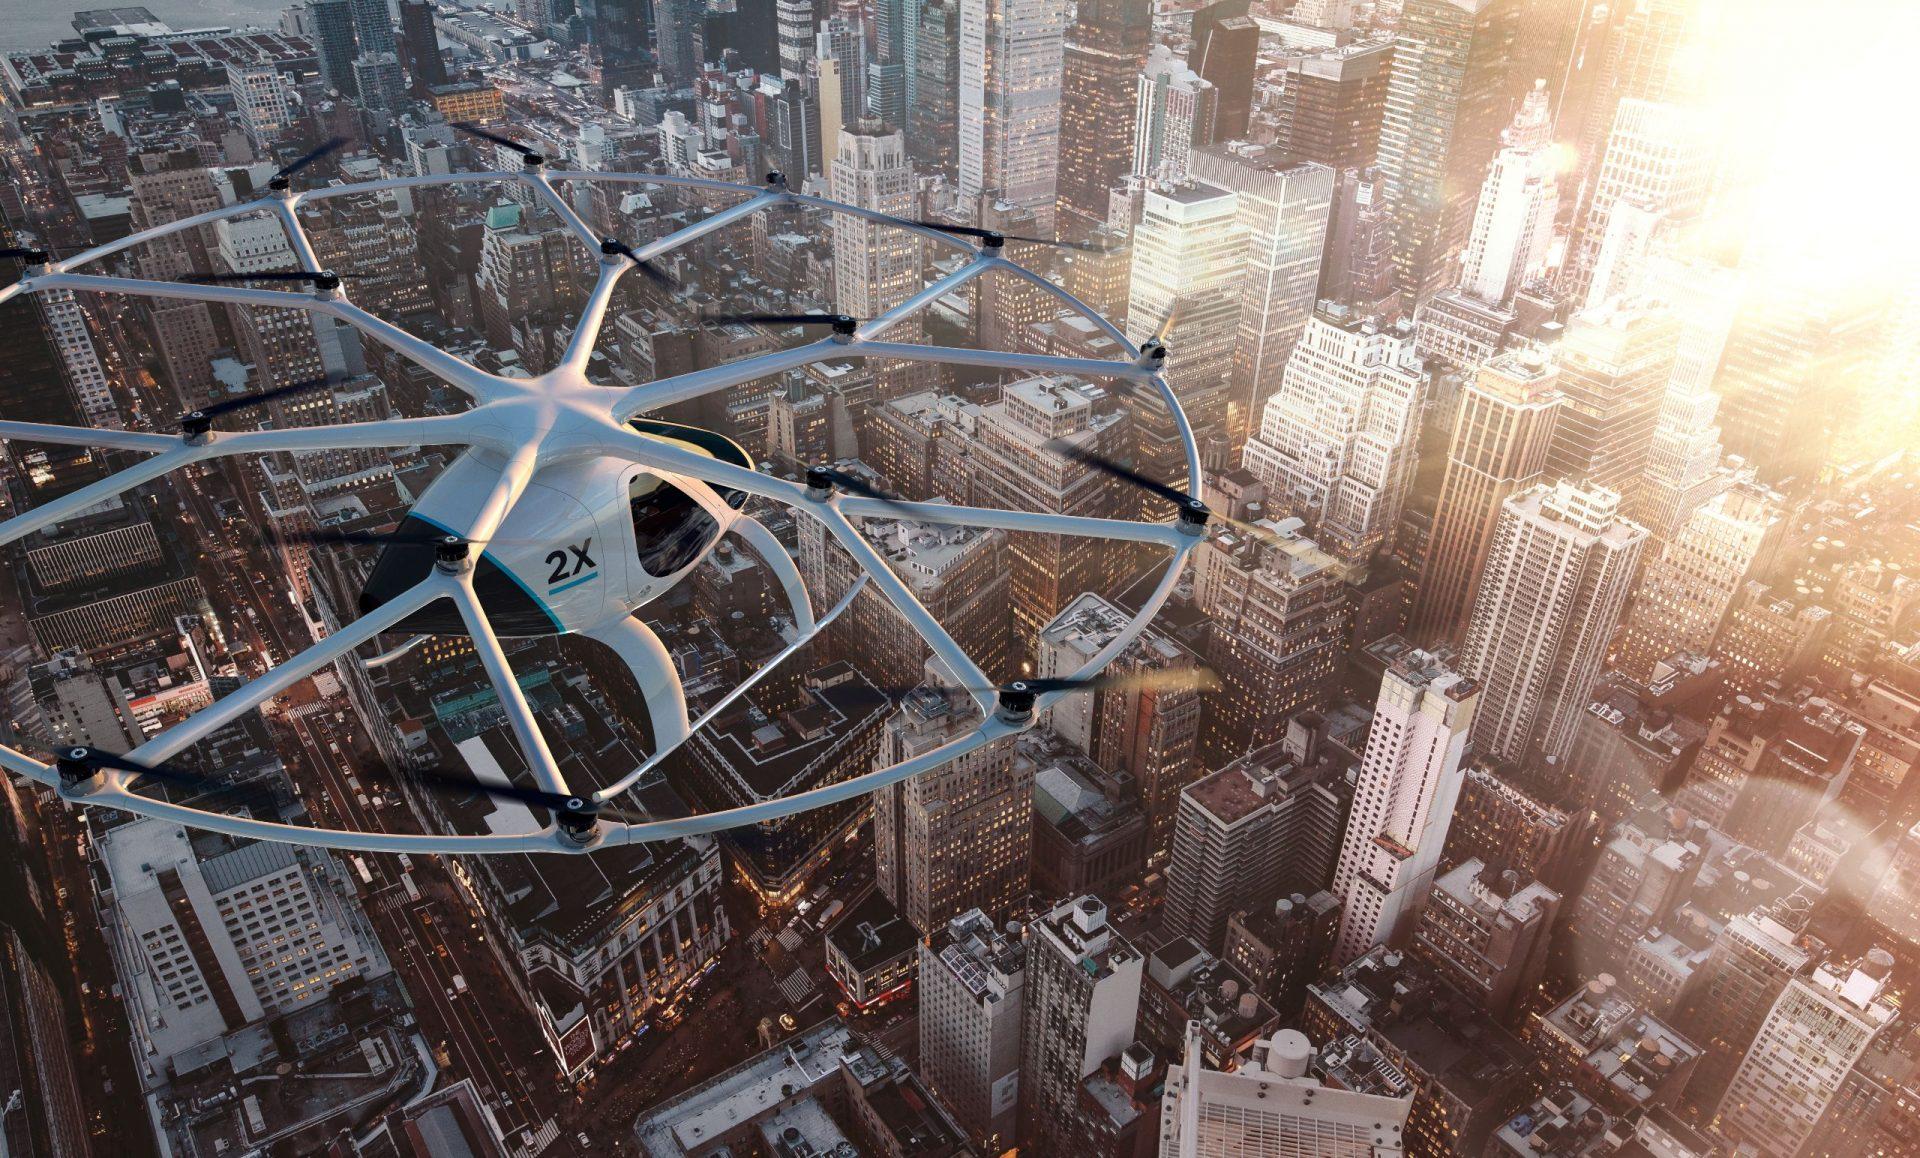 volocopter 2x city closeup